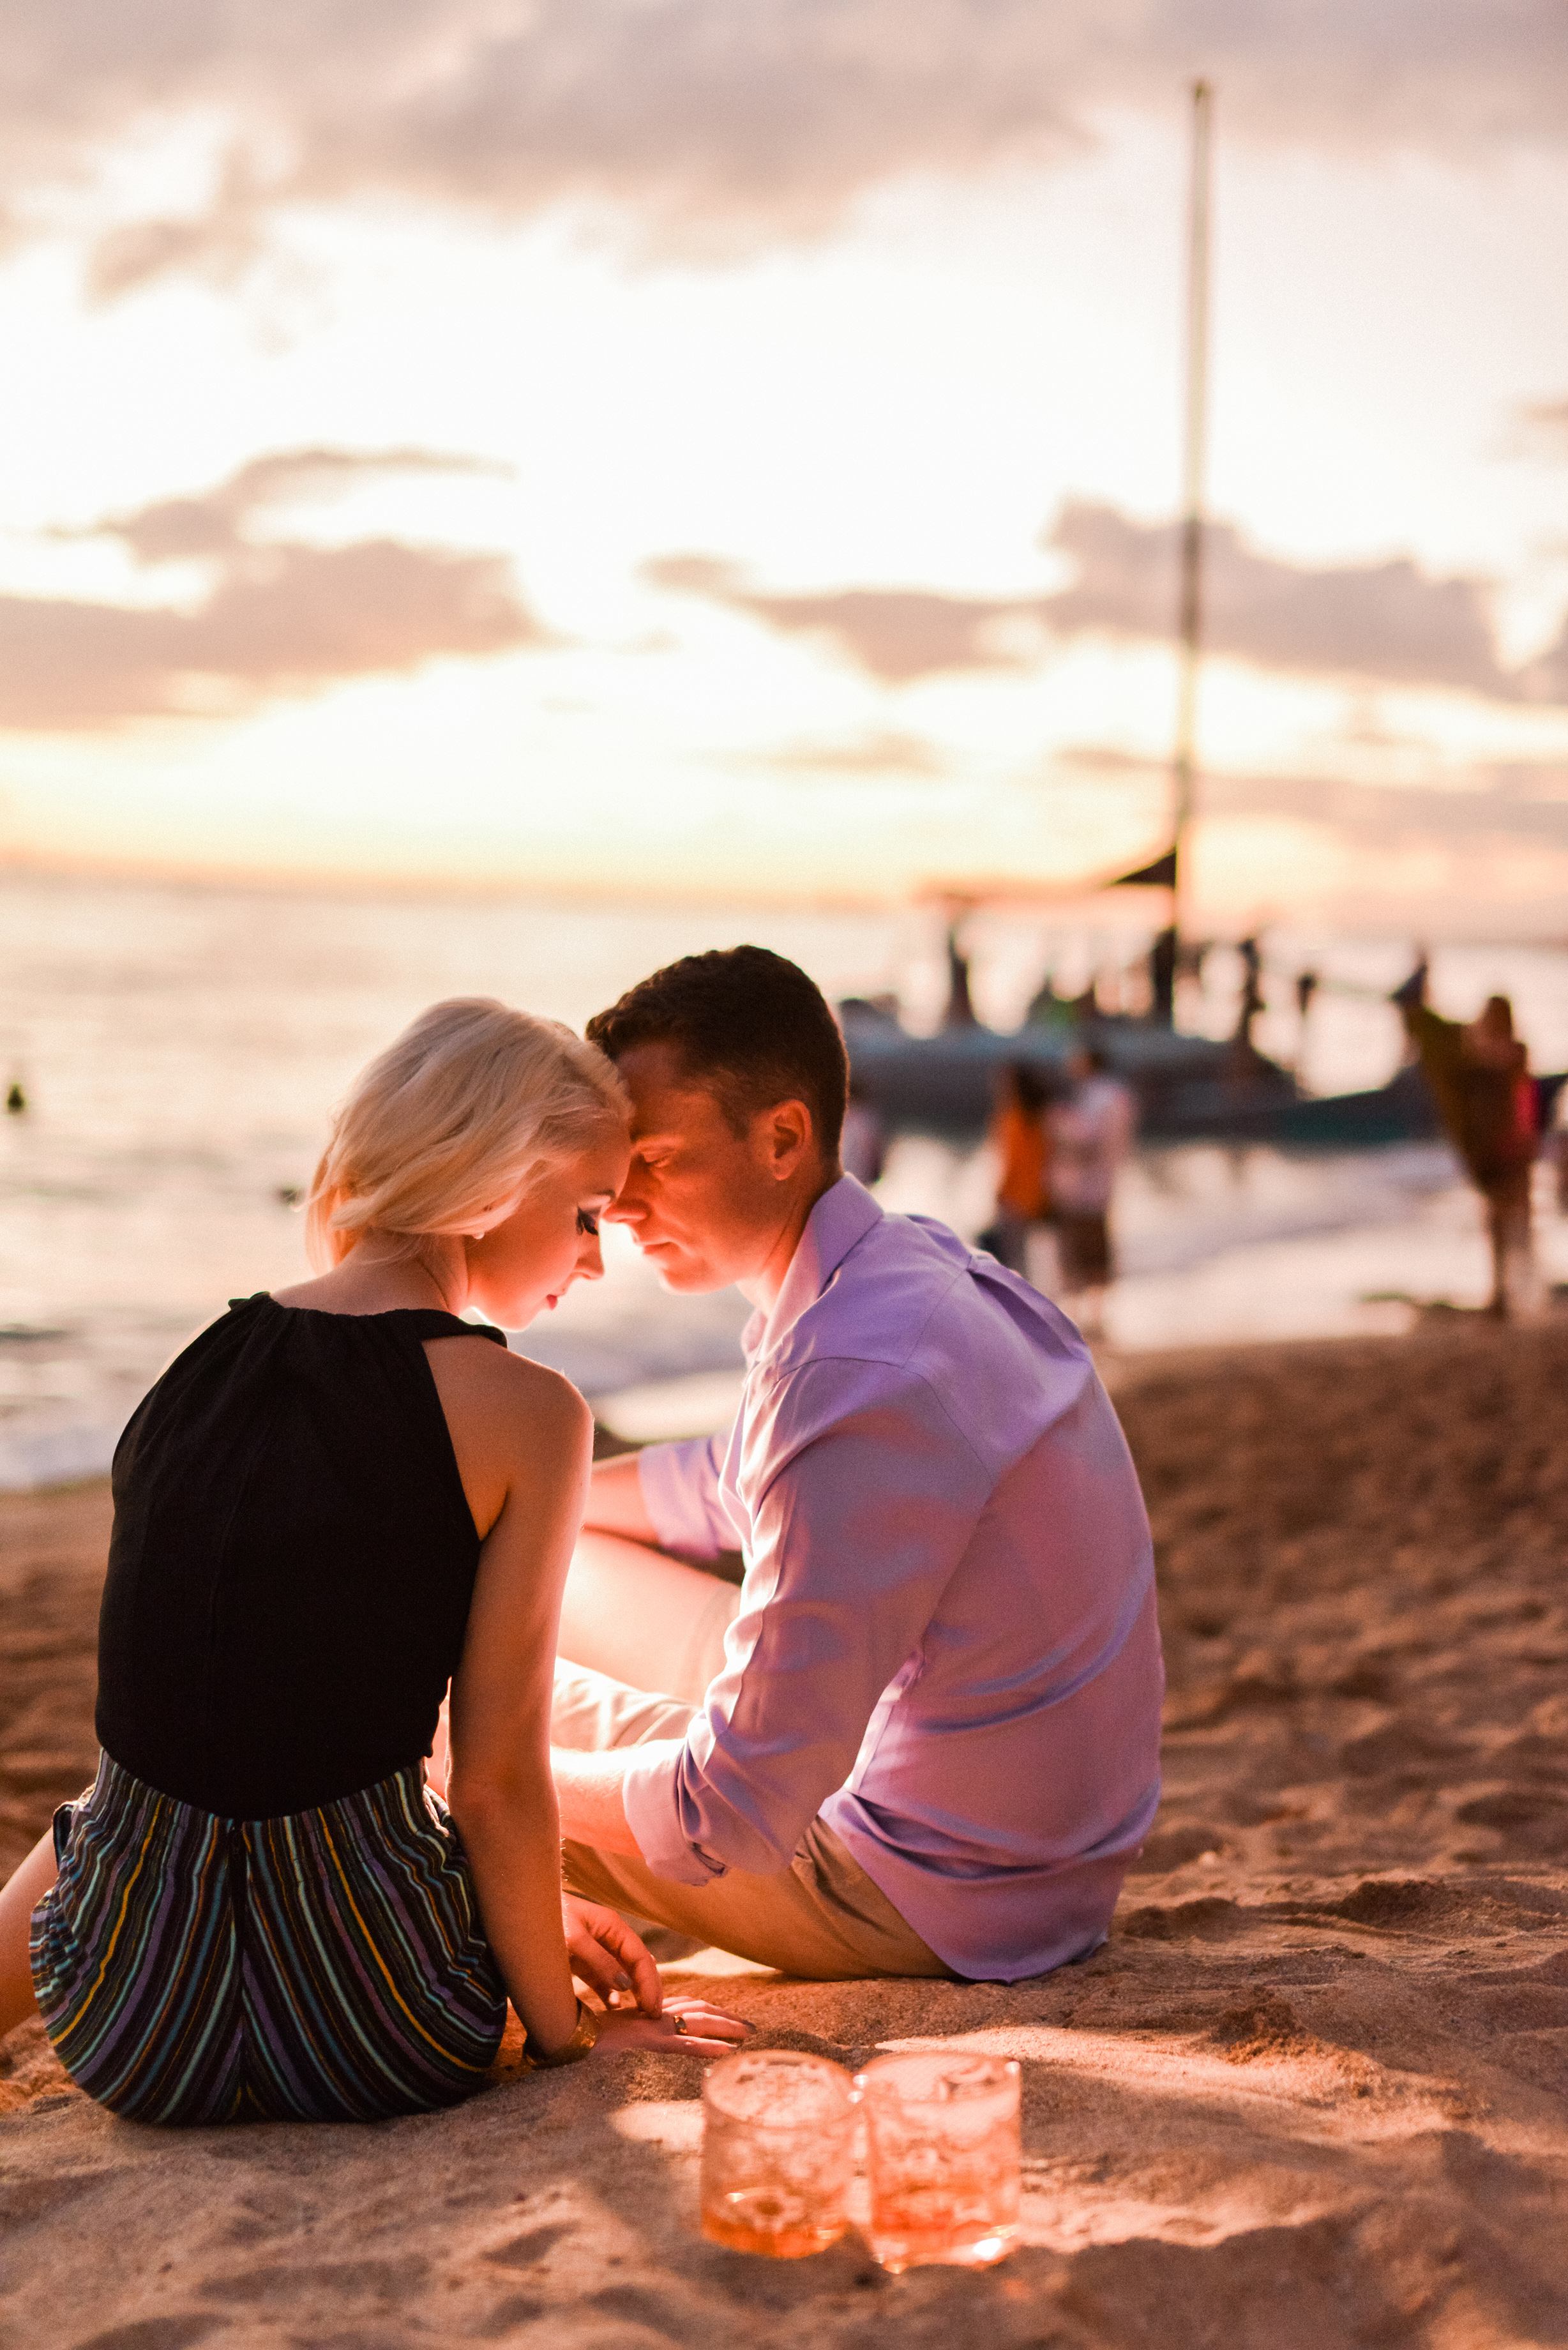 moana surfrider hotel wedding oahu hawaii stephen ludwig photography (45).jpg